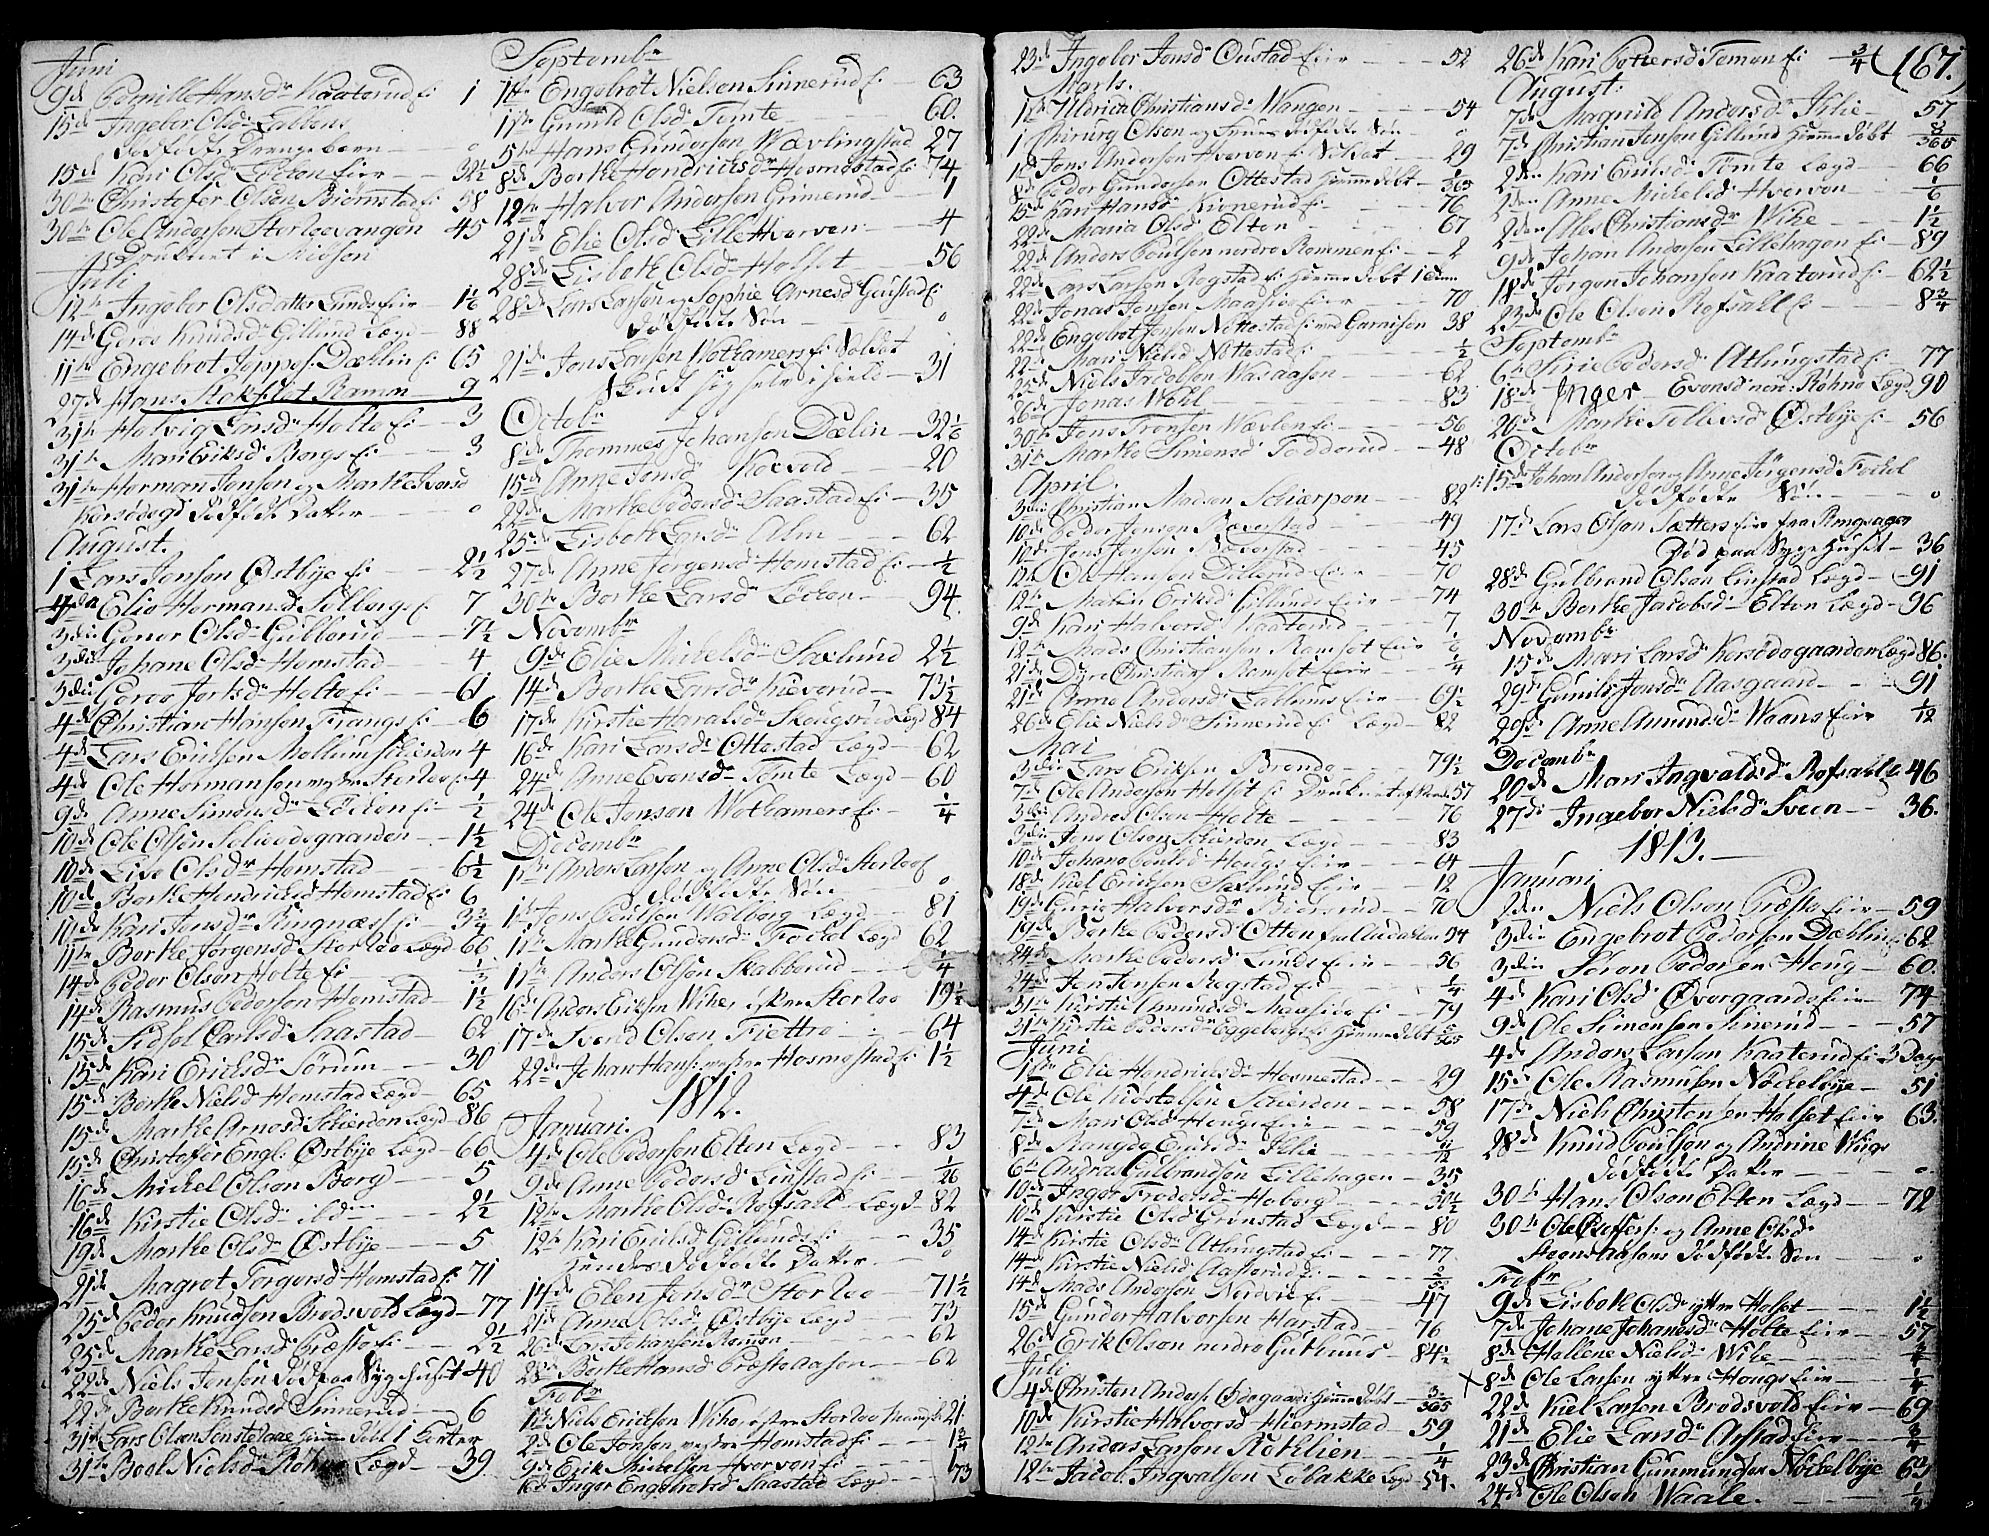 SAH, Stange prestekontor, K/L0007: Ministerialbok nr. 7, 1788-1813, s. 166-167